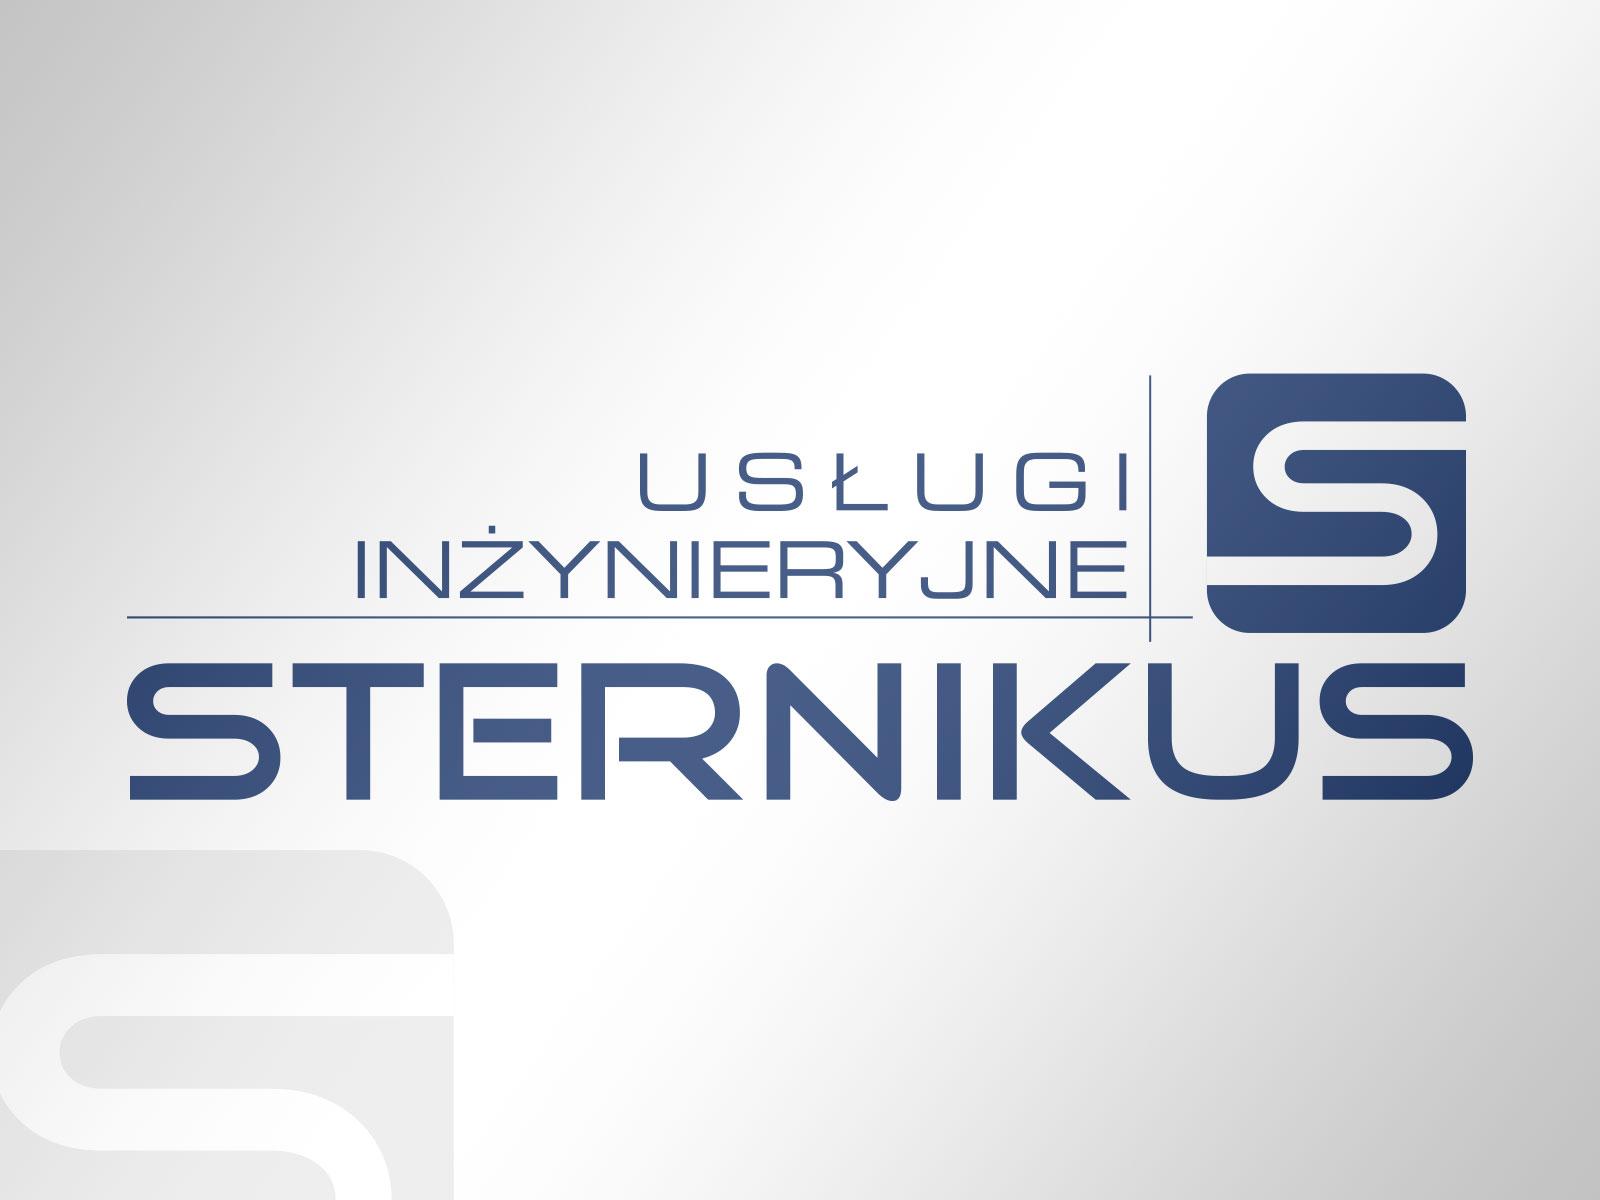 Logo Sternikus